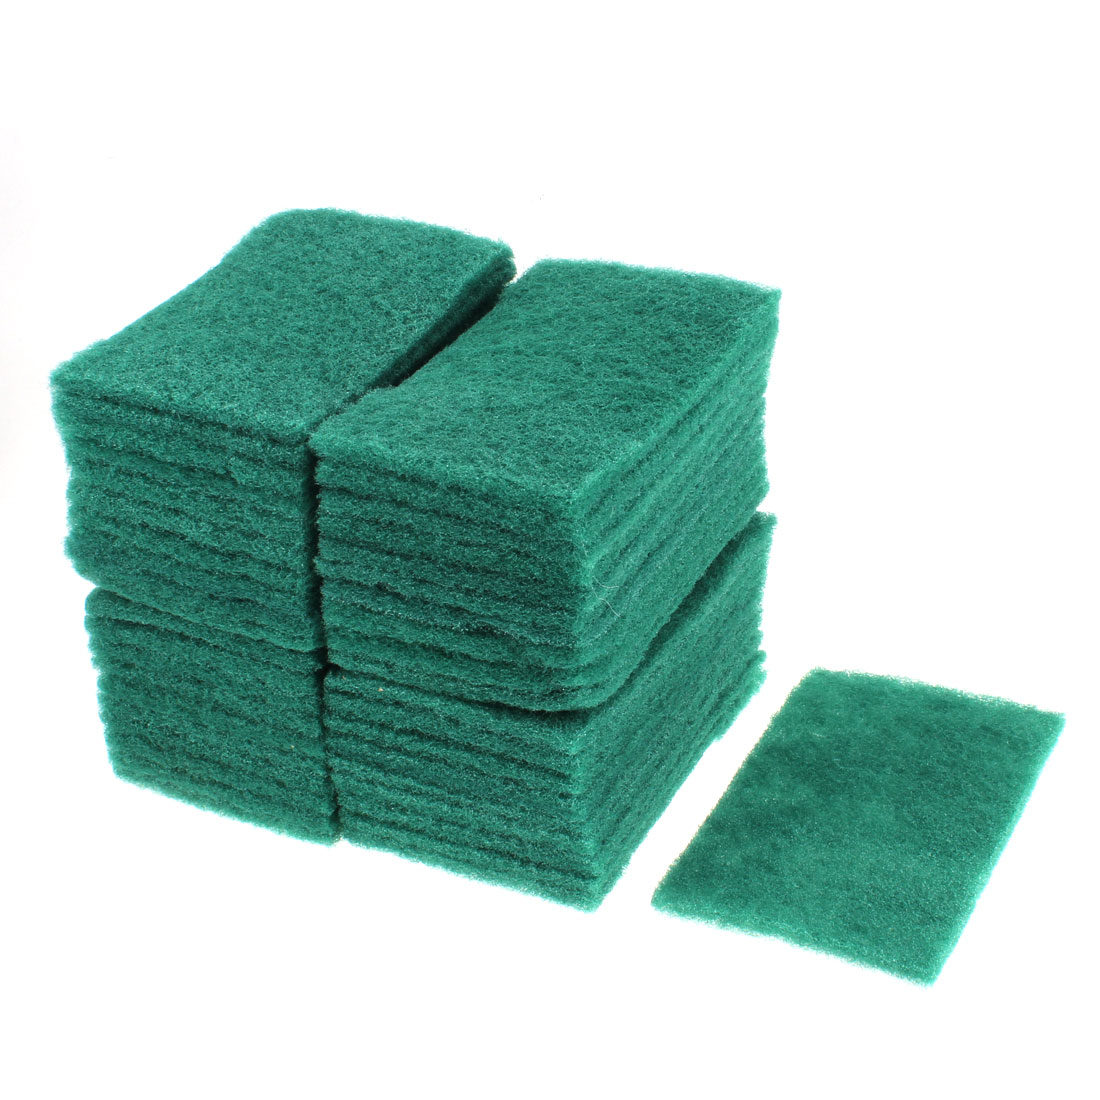 Kitchen Sponge Bowl Dish Wash Cleaning Pad 145mm x 97mm Green 40pcs